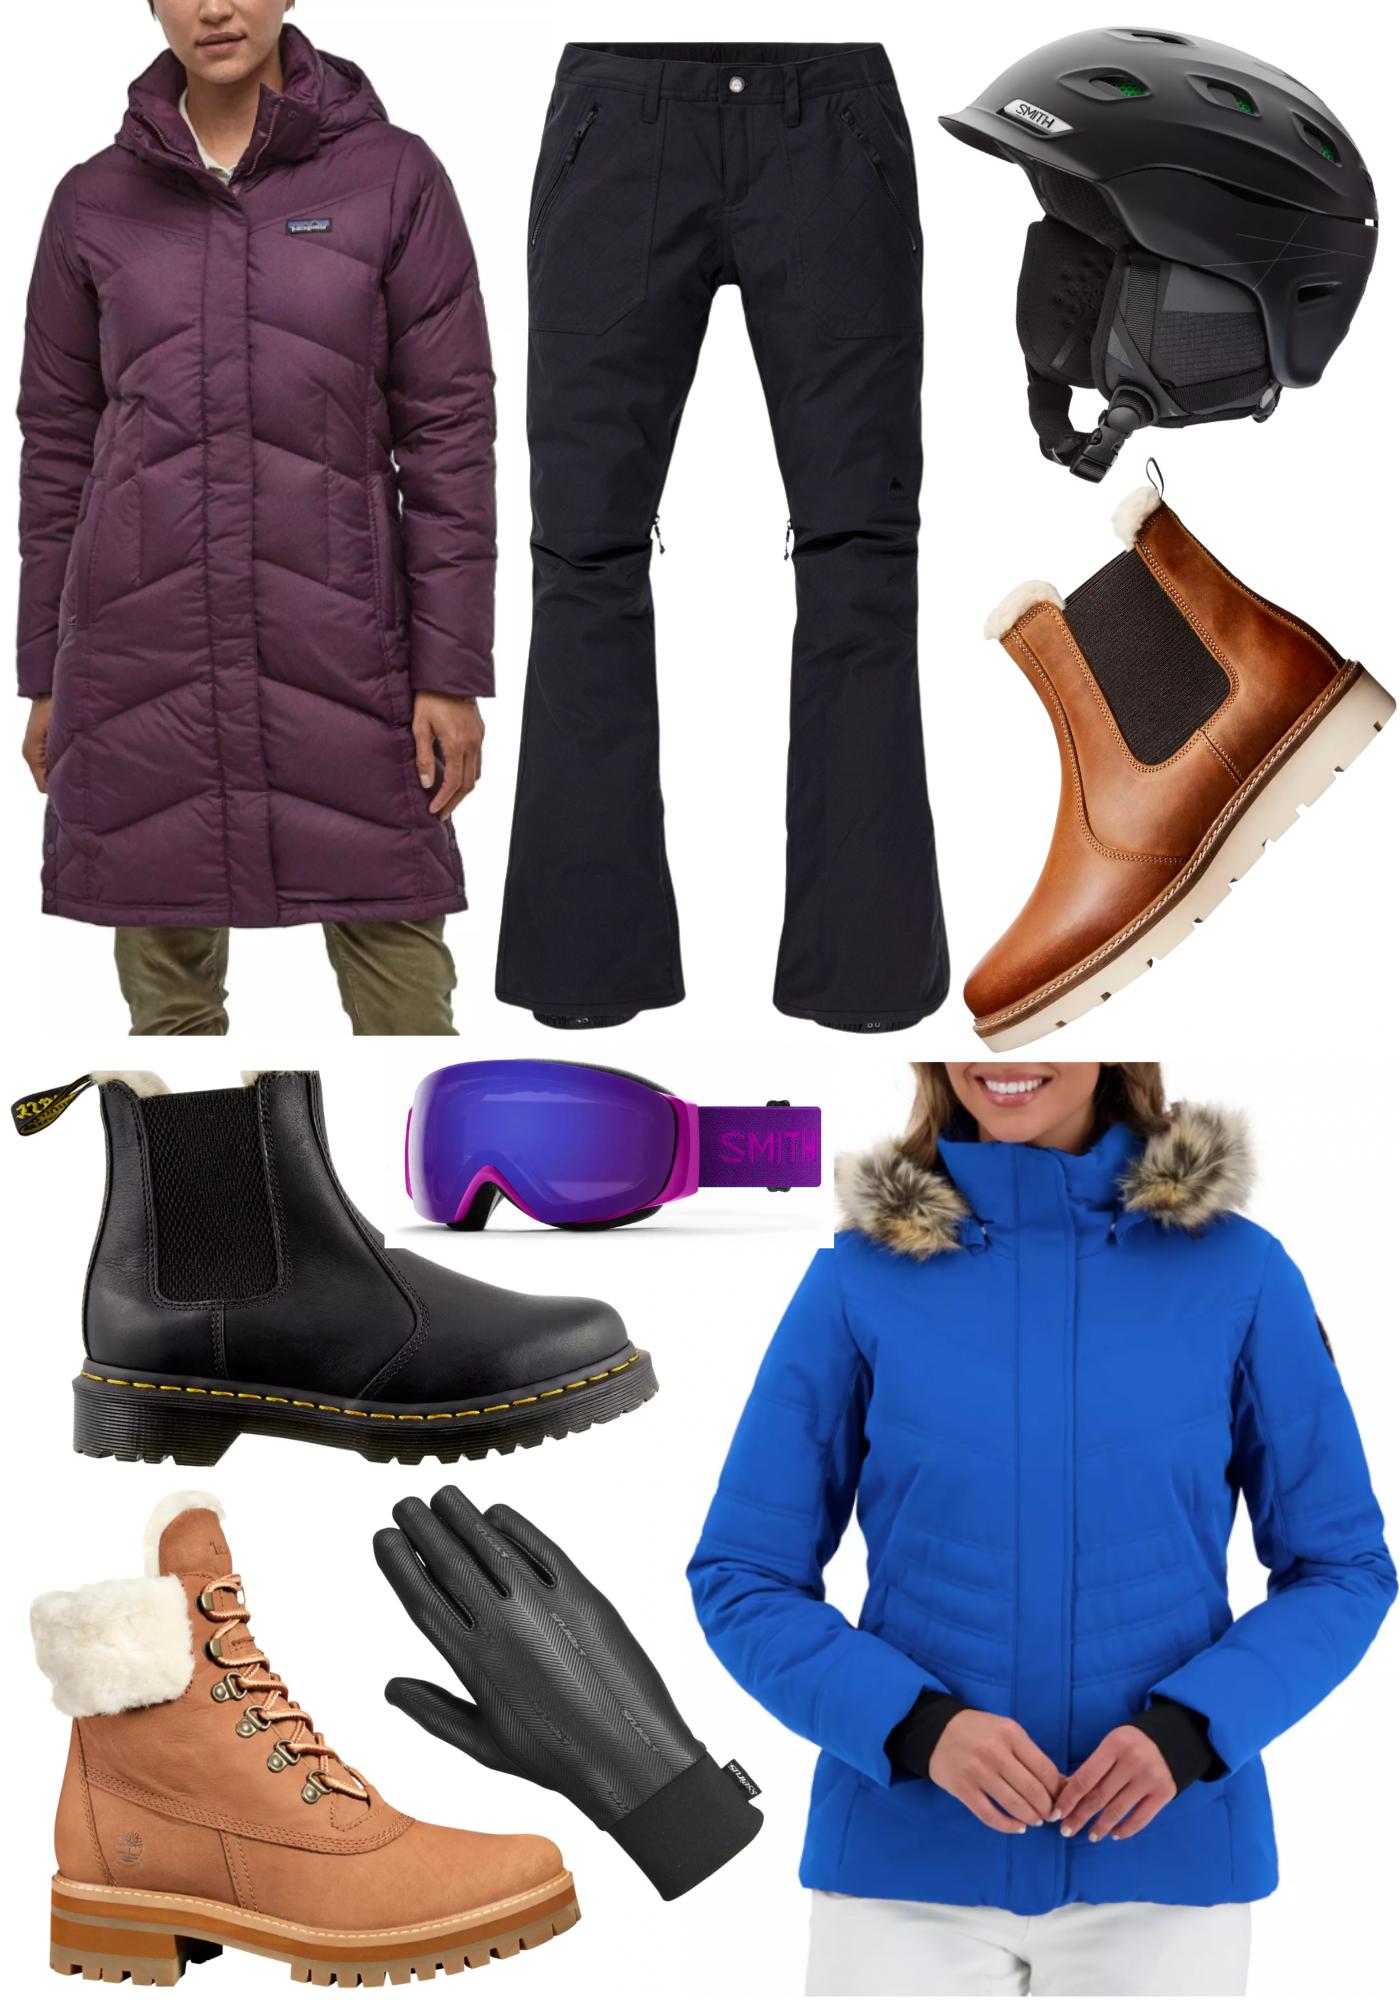 Dicks sporting goods winter brands collage